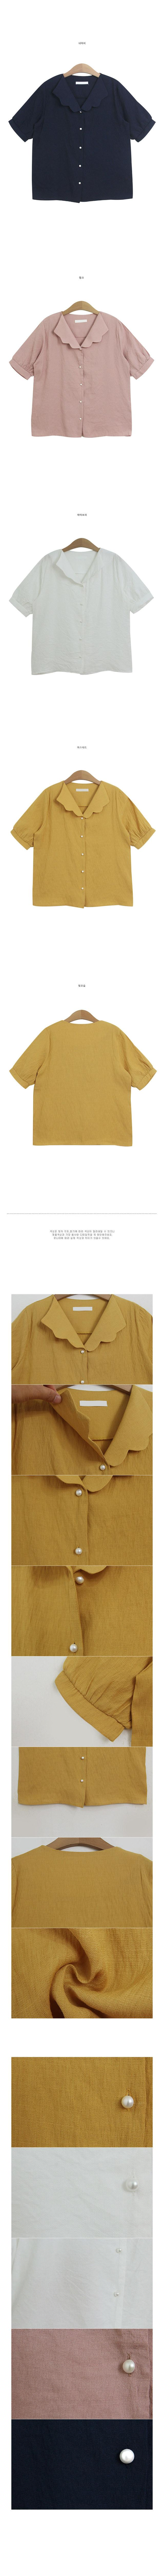 Coed blouse